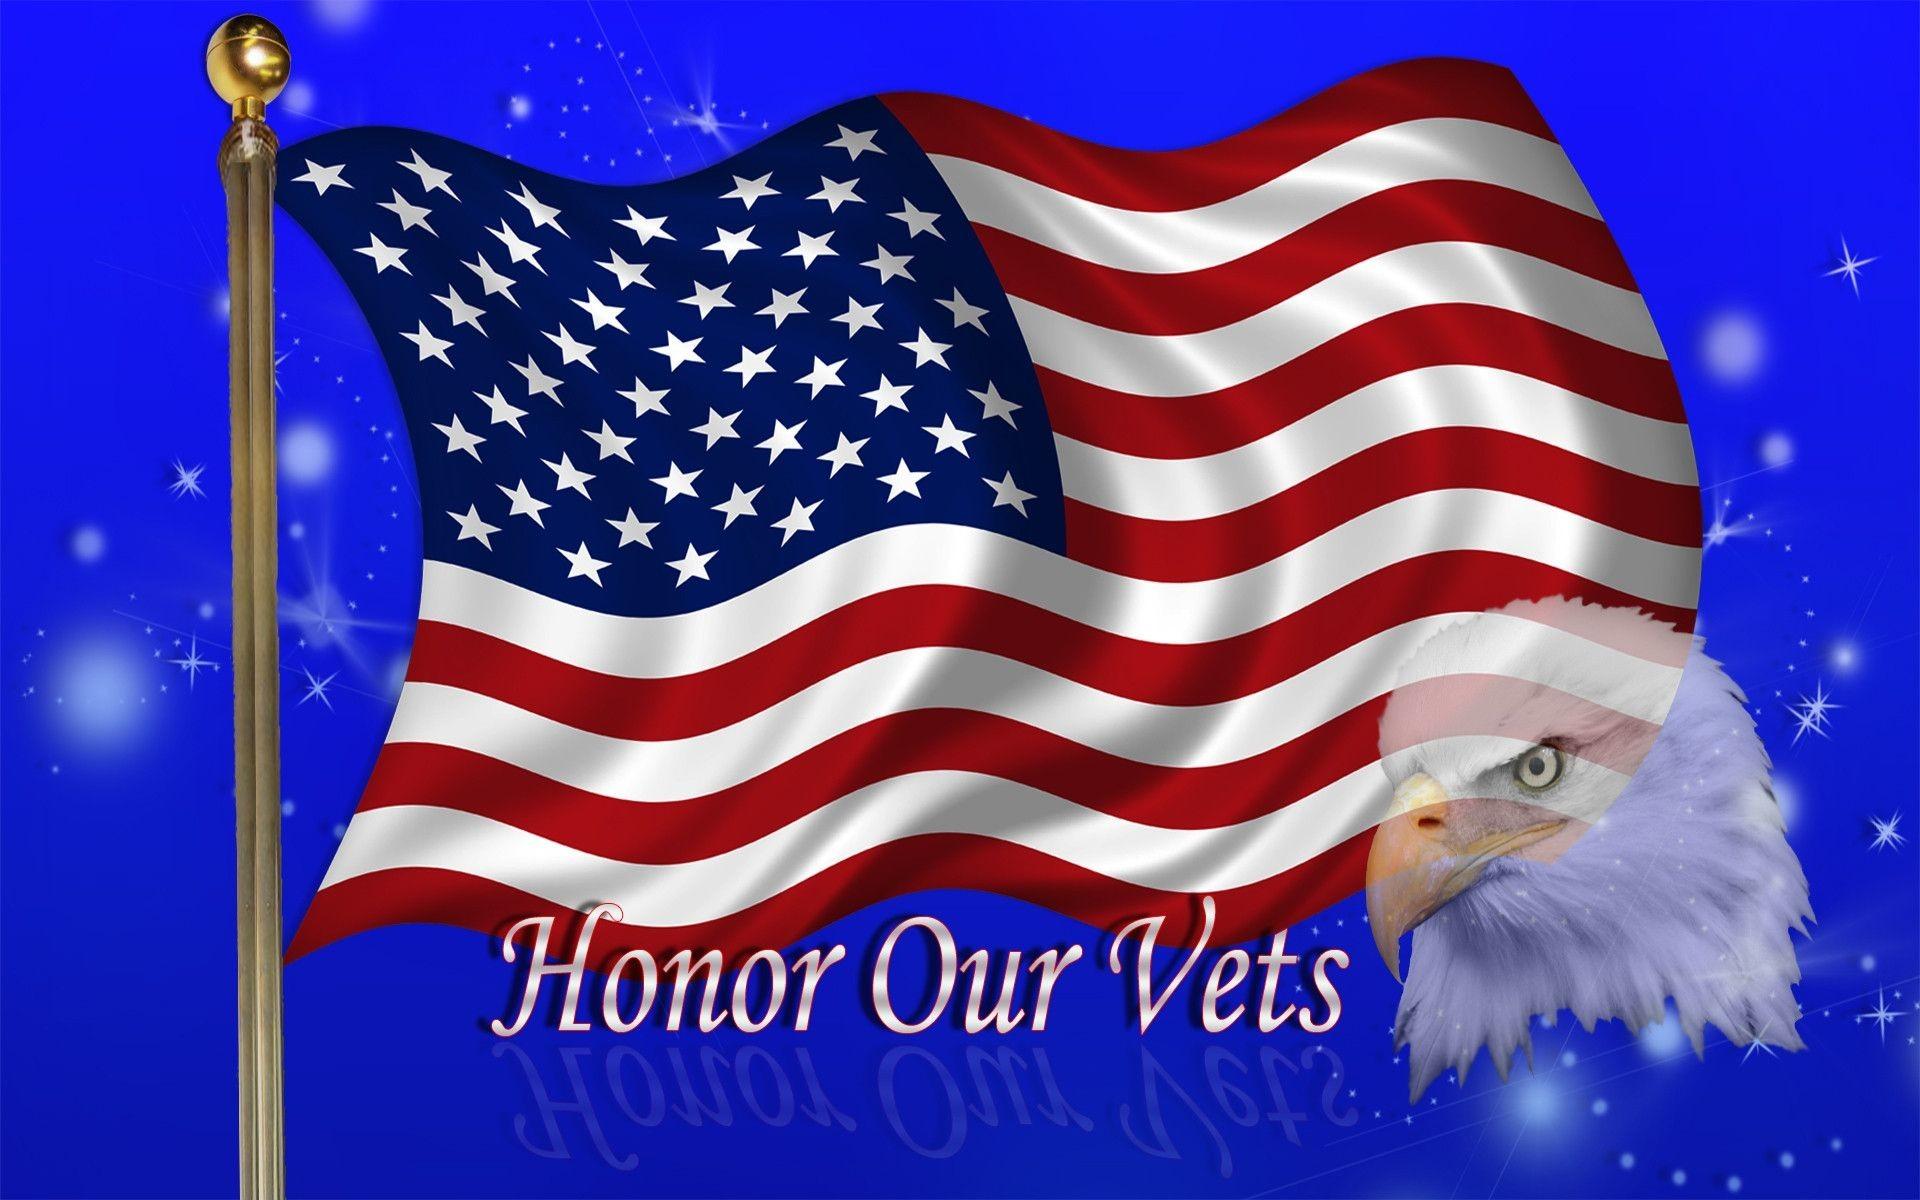 Google Veterans Day Wallpaper